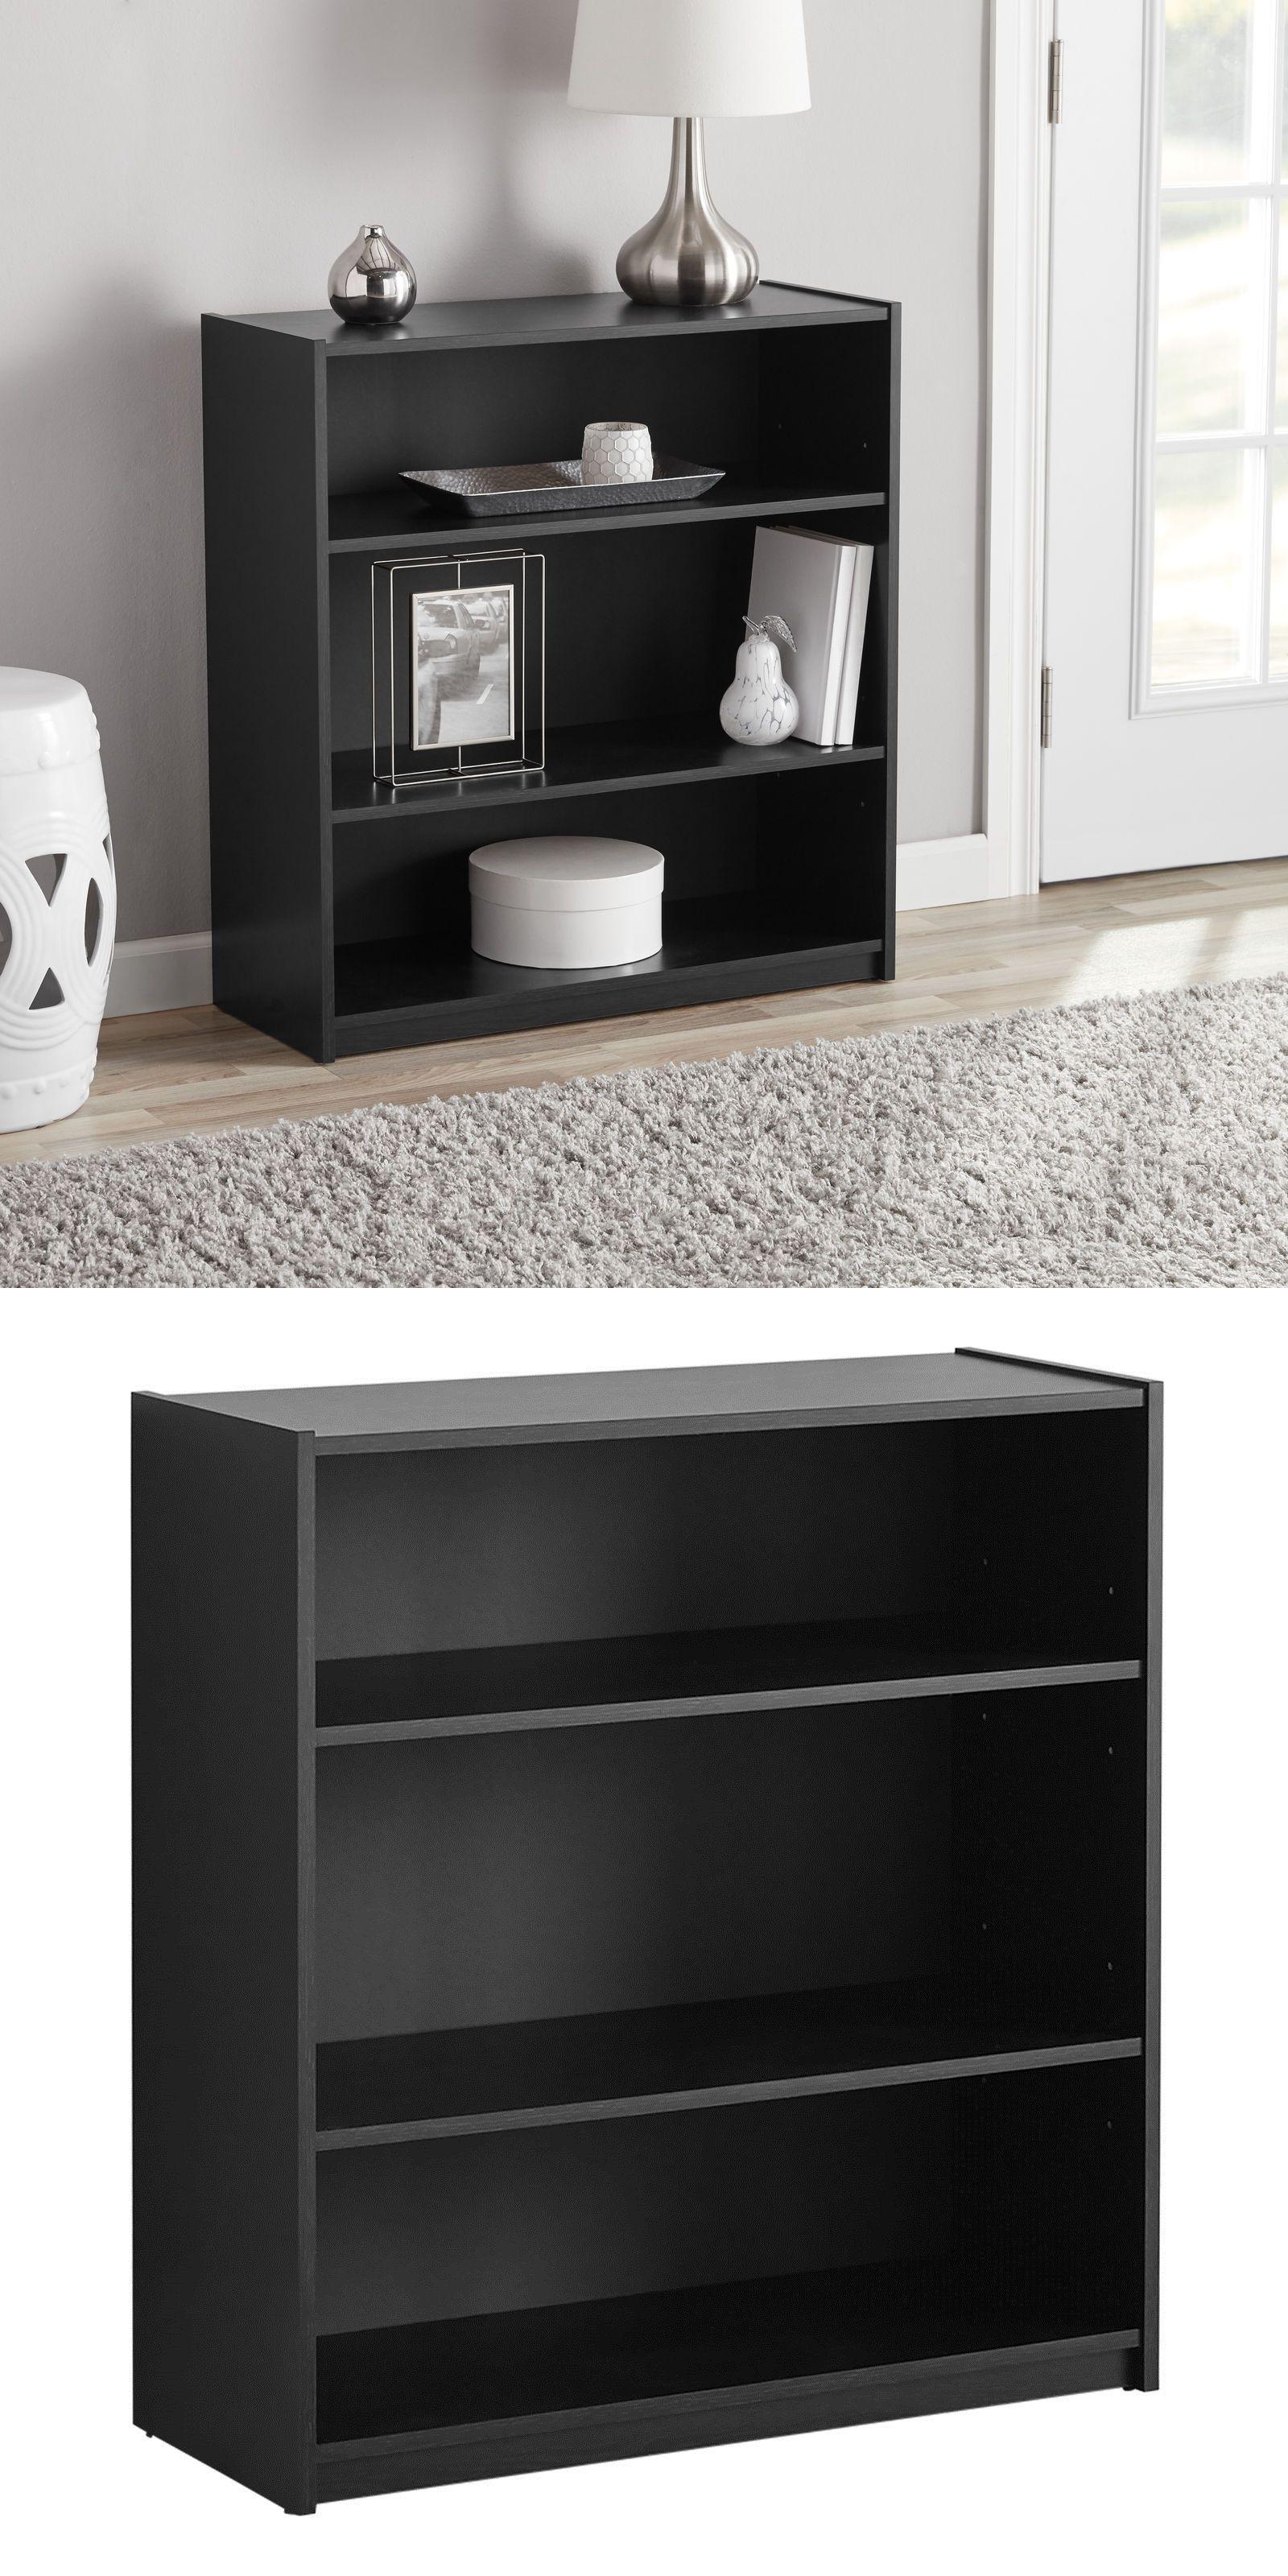 Fashionable Bookcases 3199: Adjustable 3 Shelf Standard Bookcase With Regard To Standard Bookcases (View 17 of 20)